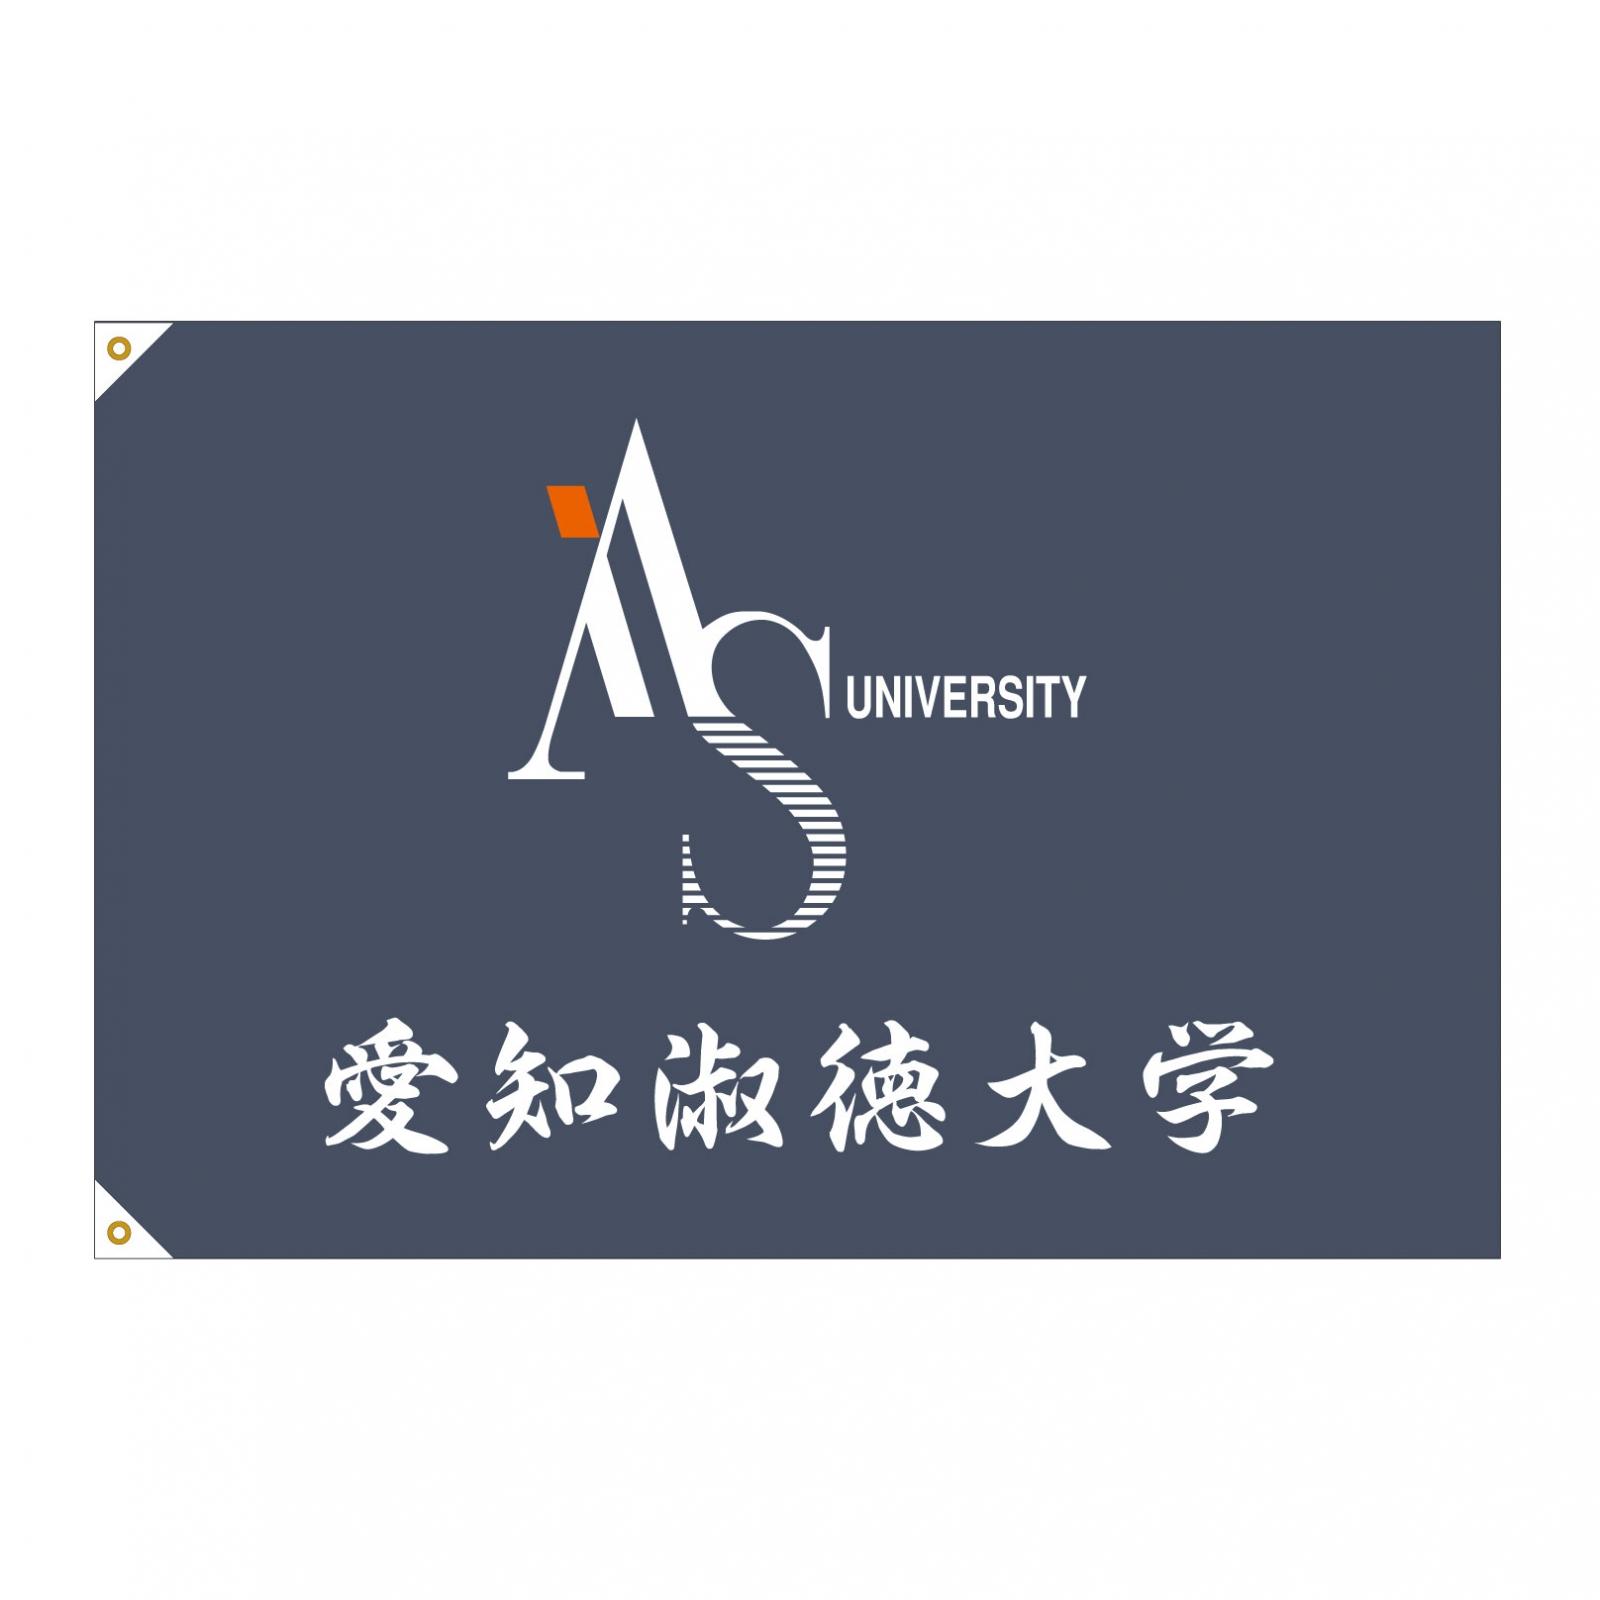 大学陸上部の部旗